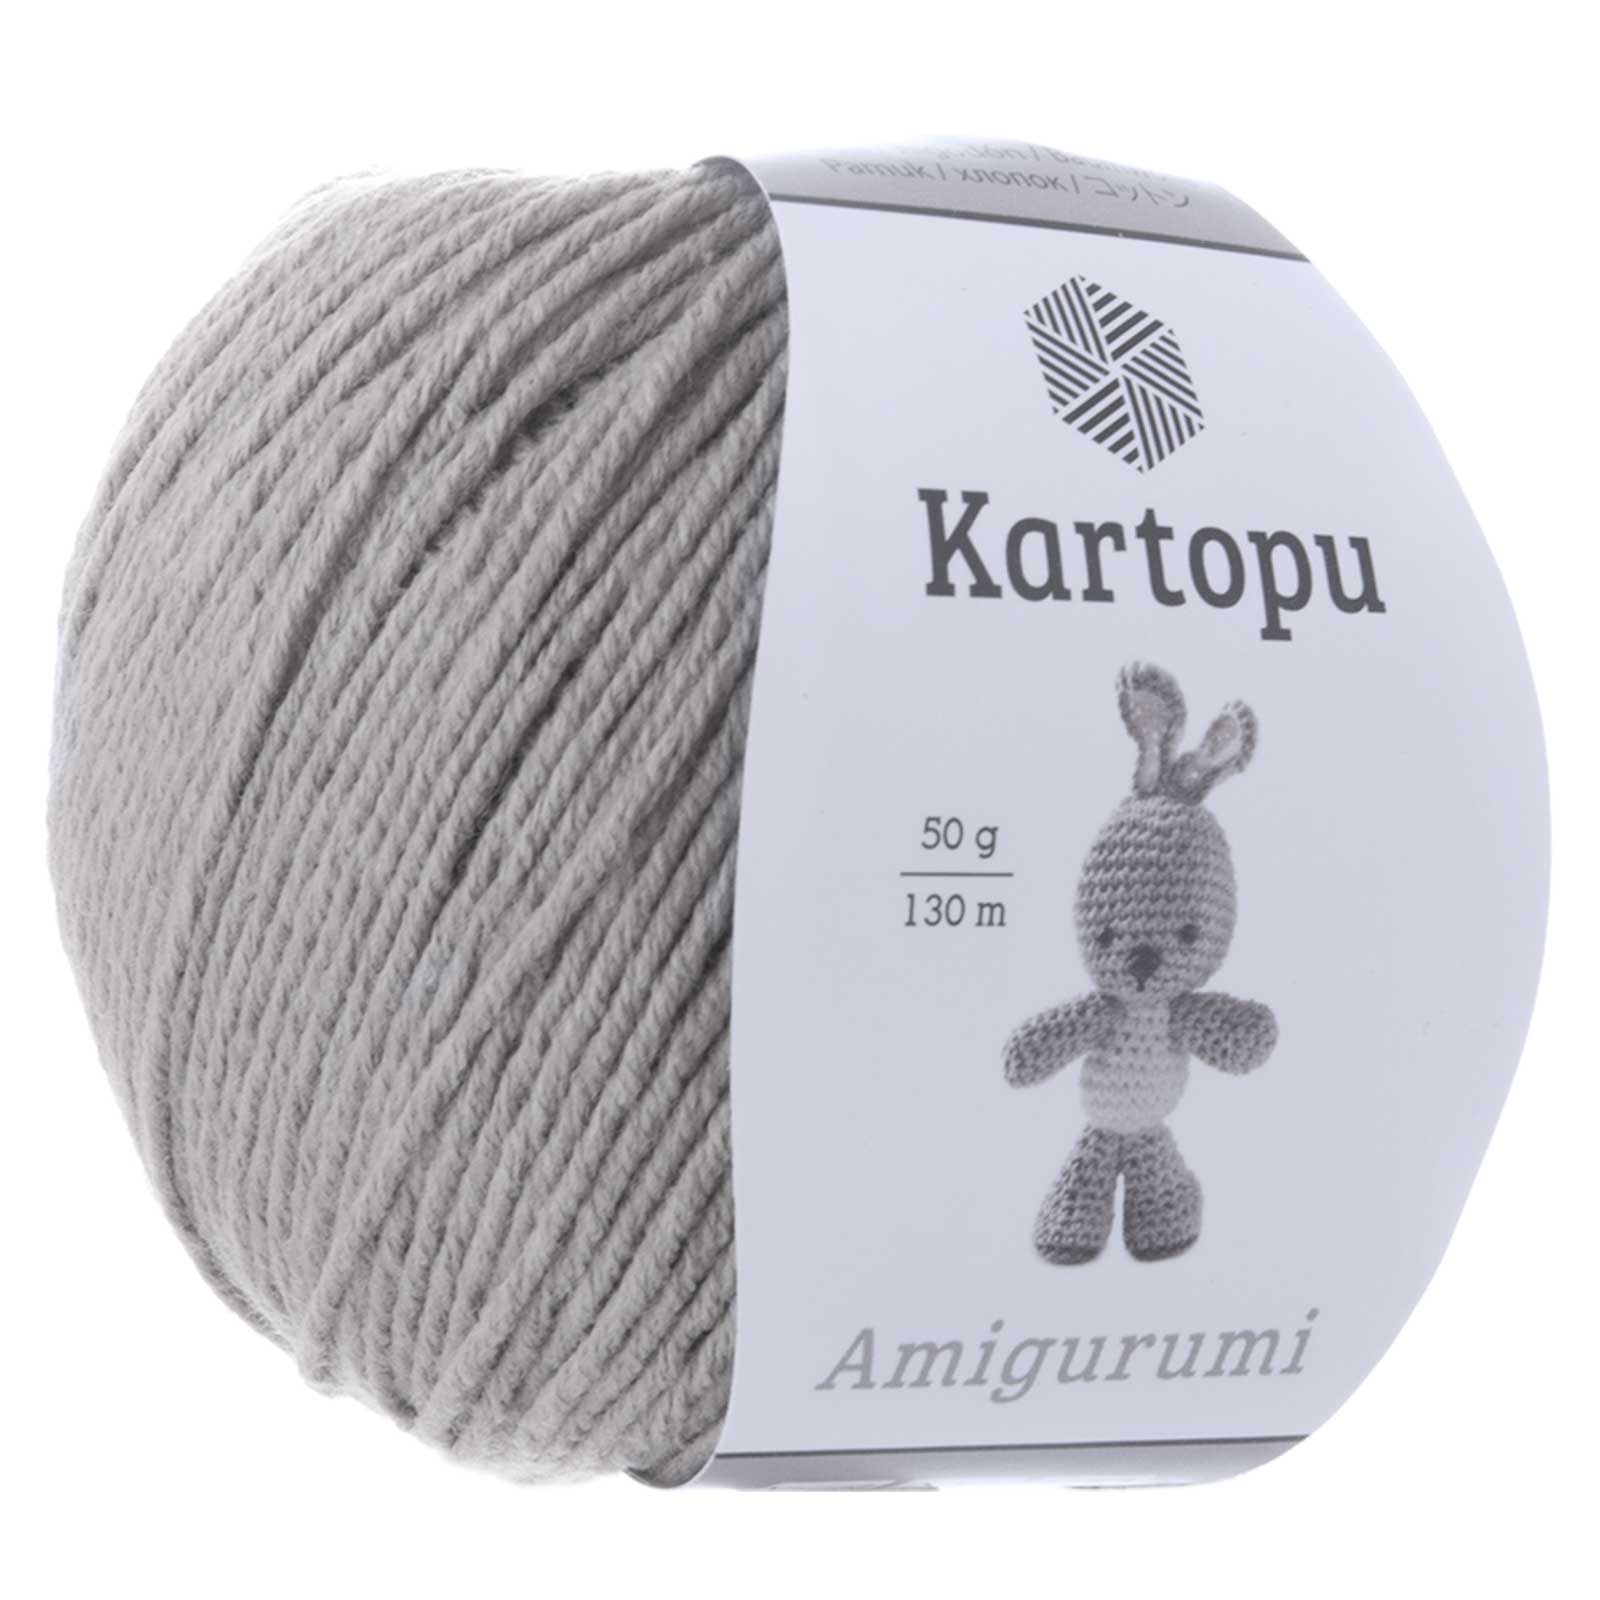 3 Knäuel Kartopu Amigurumi insgesamt 50 g / 142 ... - Amazon.de | 1600x1600